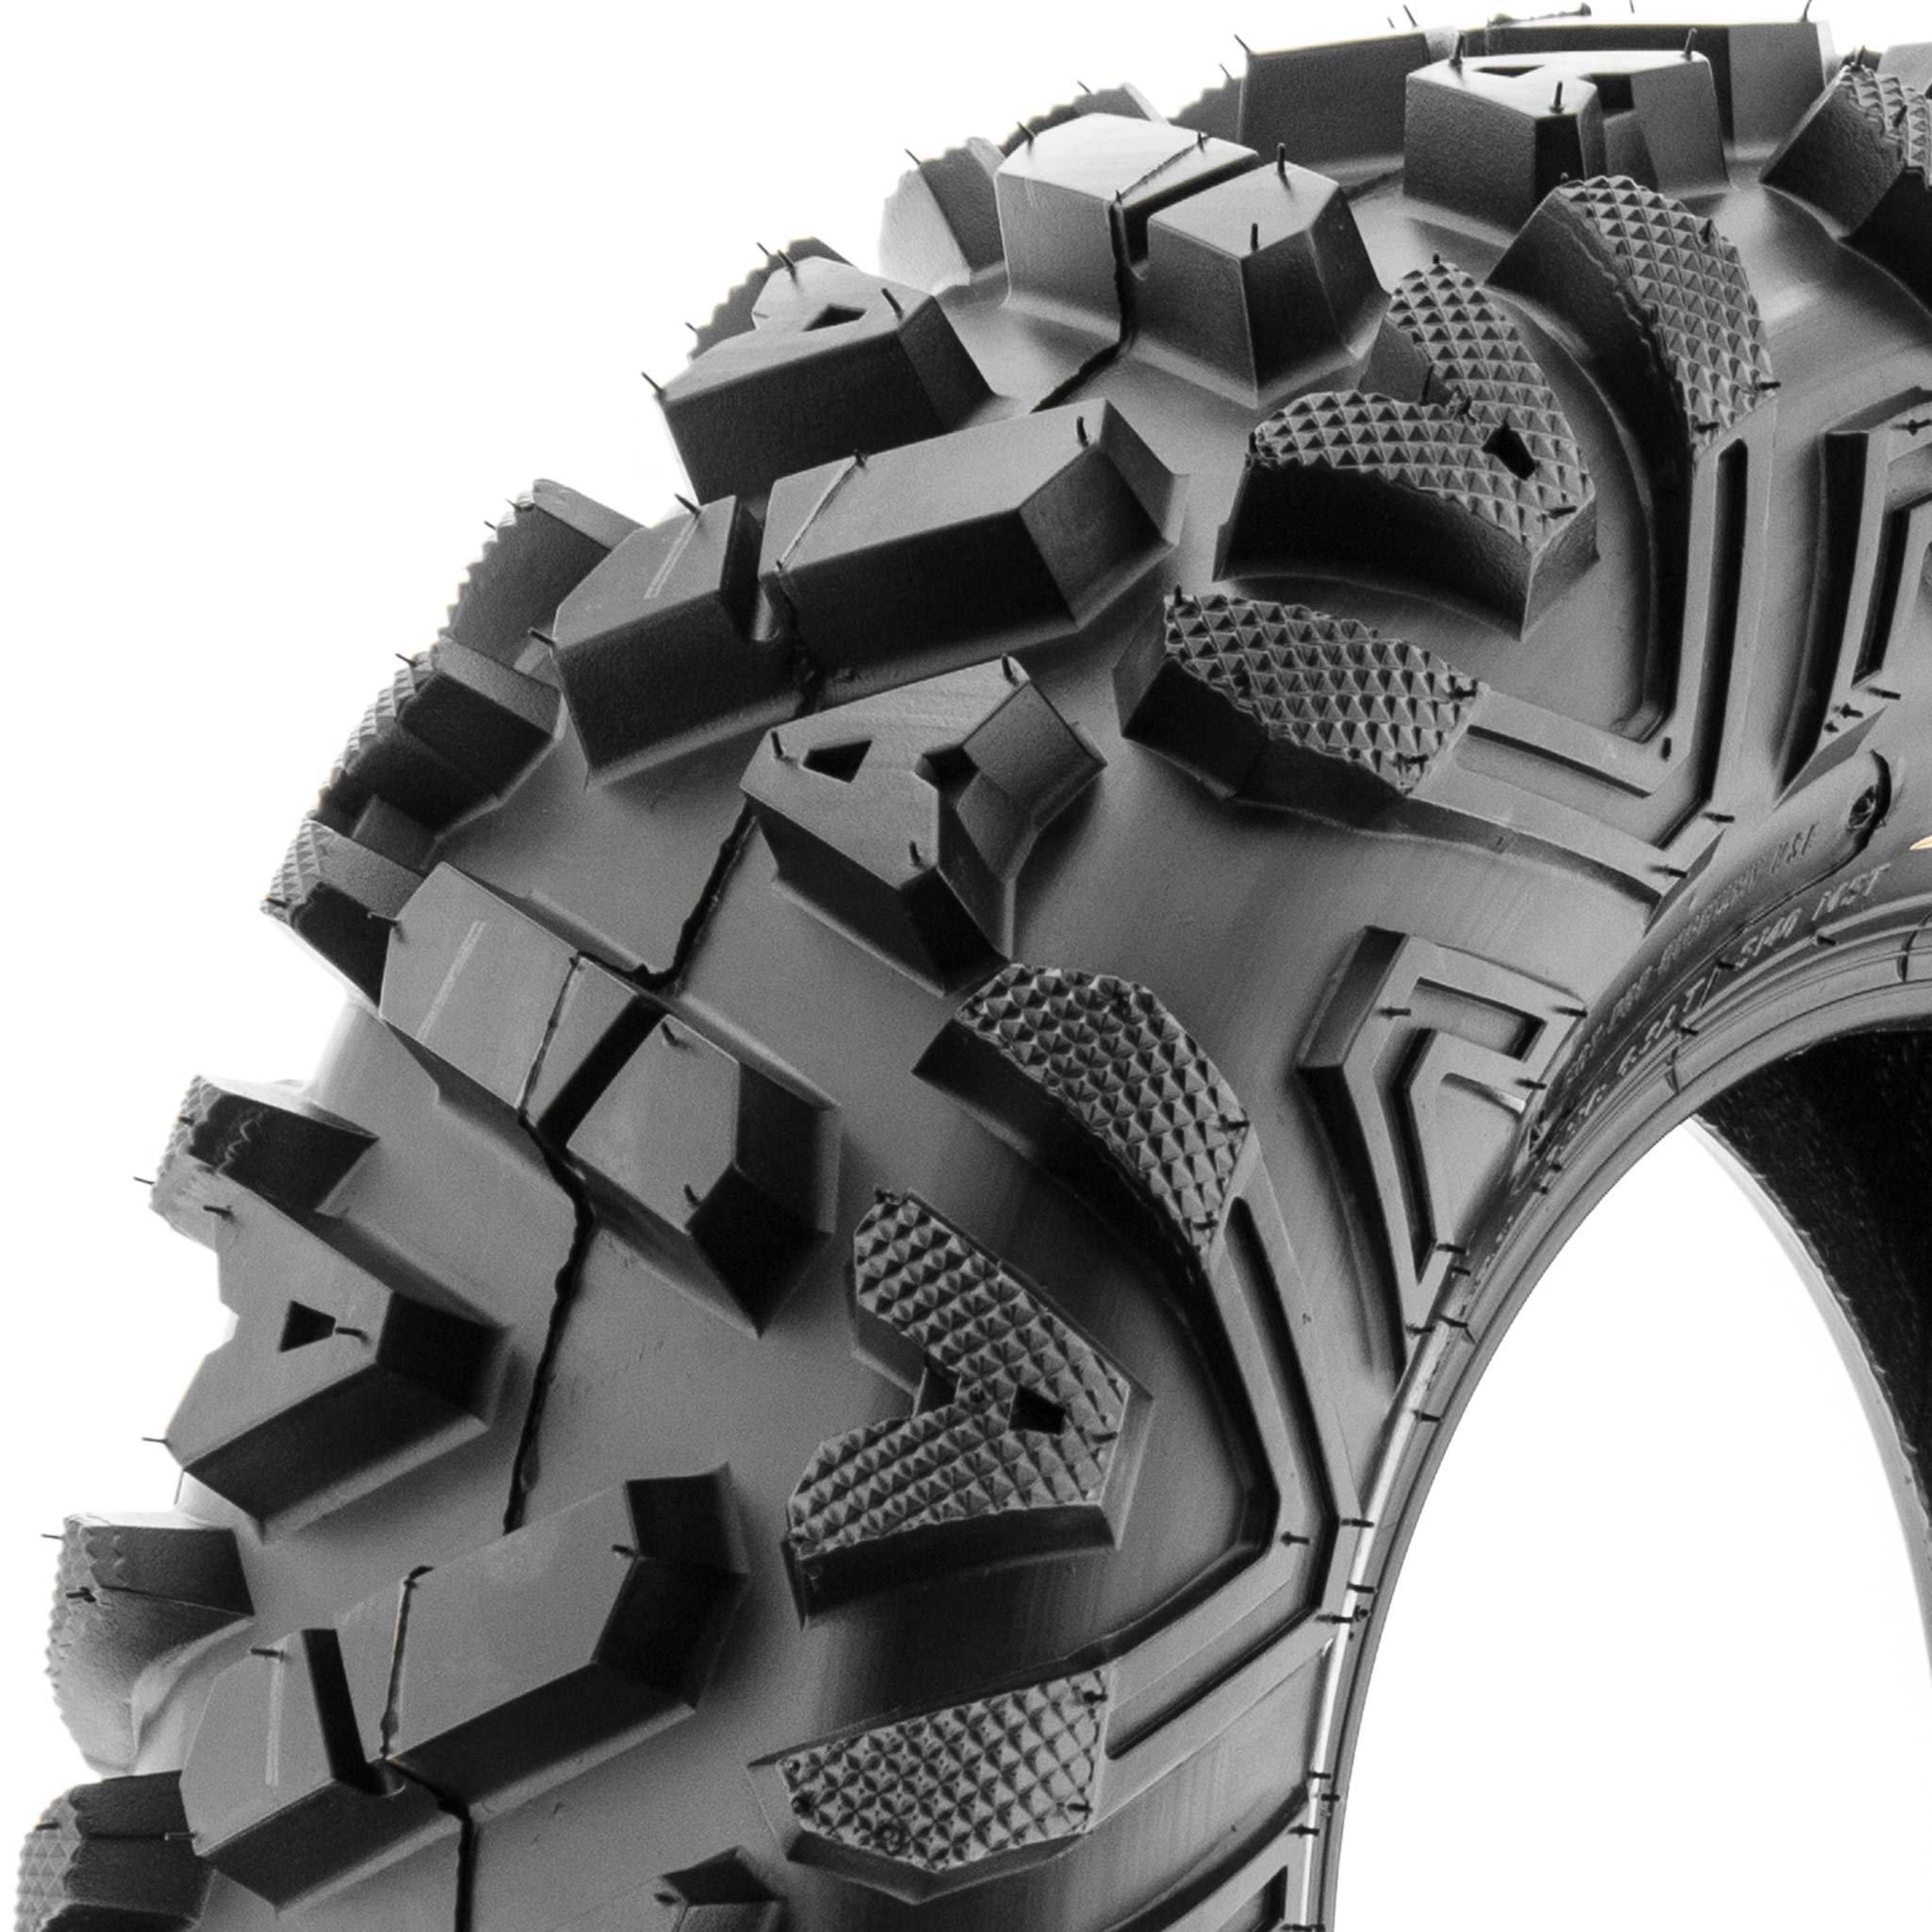 SunF ATV UTV A/T 26x8-12 All Trail 6 PR Tubeless Replacement Tire A033 POWER I, [Single]